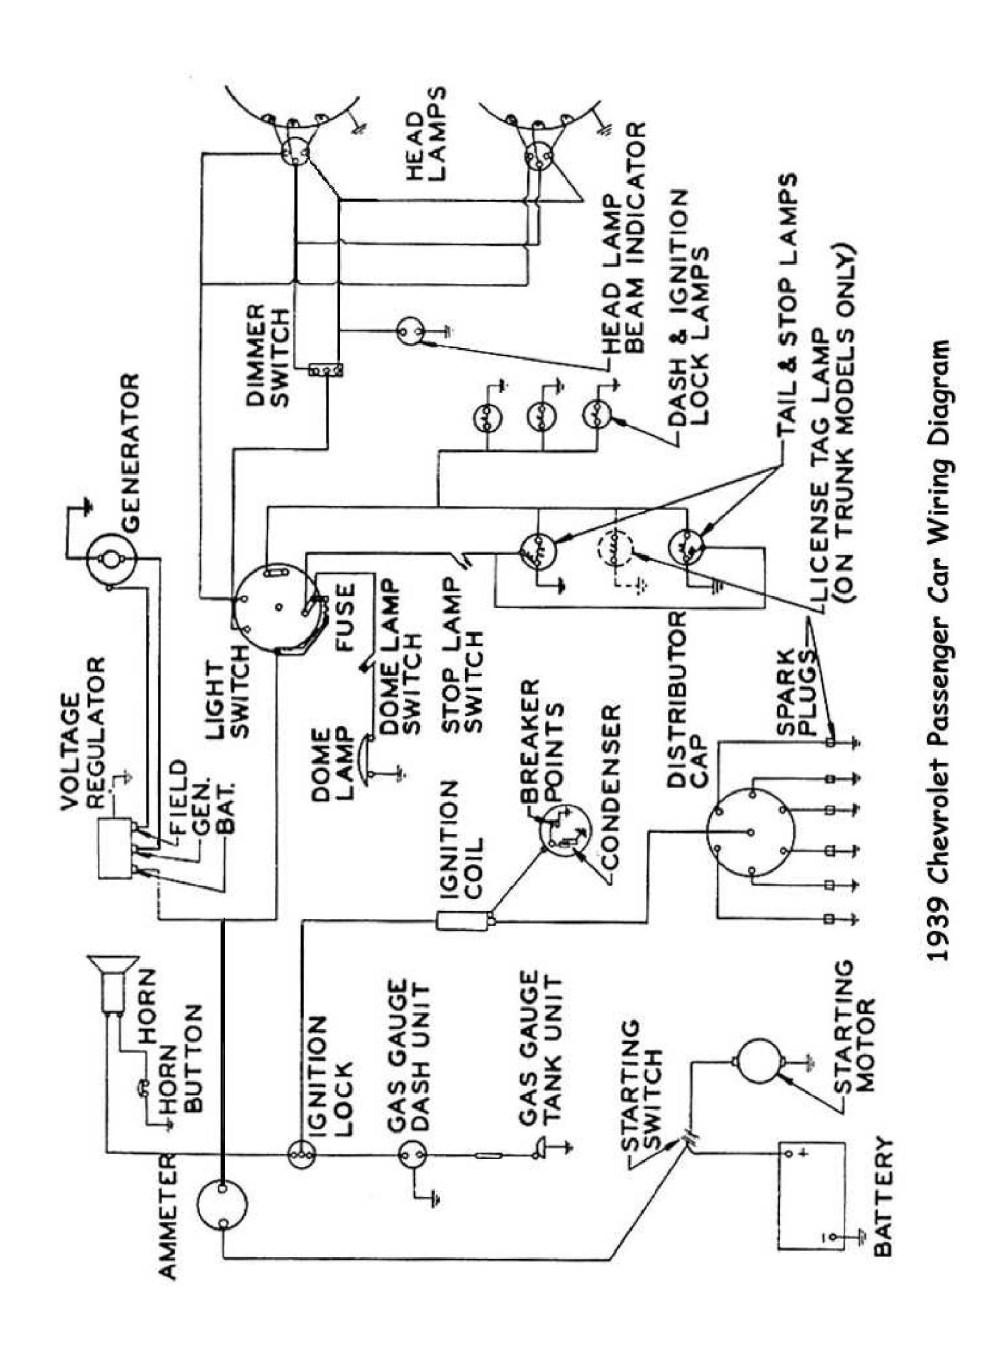 medium resolution of 65 chevy alternator wiring diagram wiring library wiring diagram ford alternator 2004 gto also 2001 dodge caravan 3 3